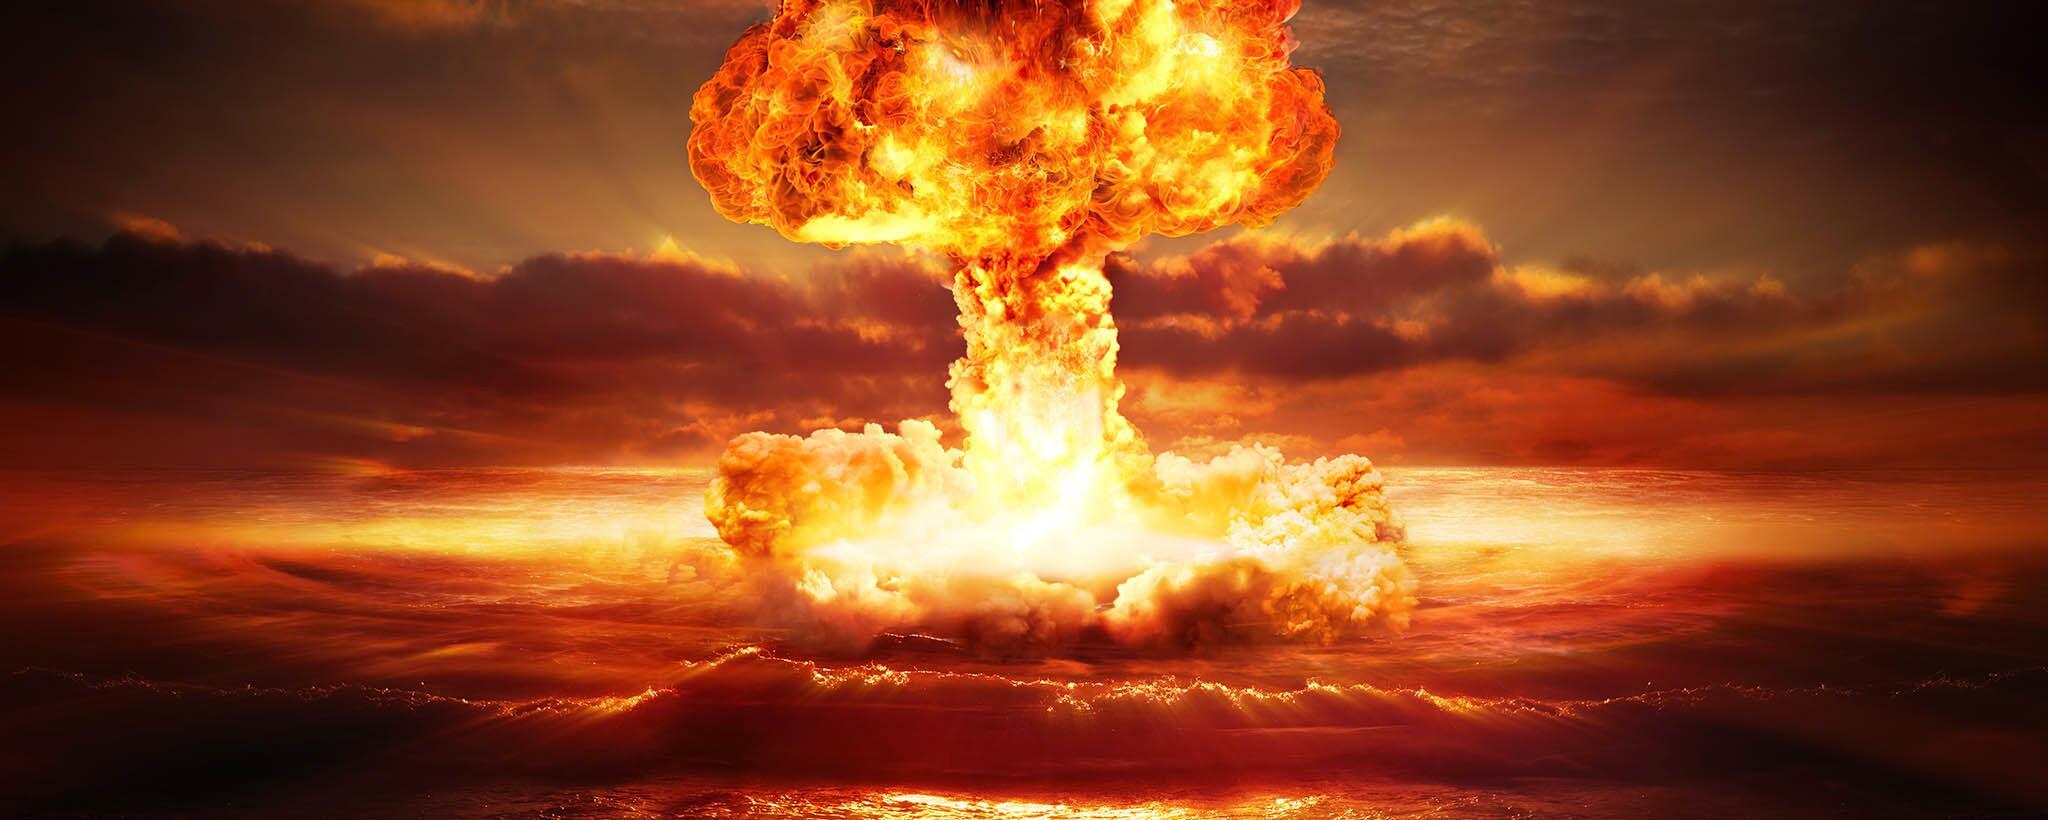 hero_nuclear_blast.jpg